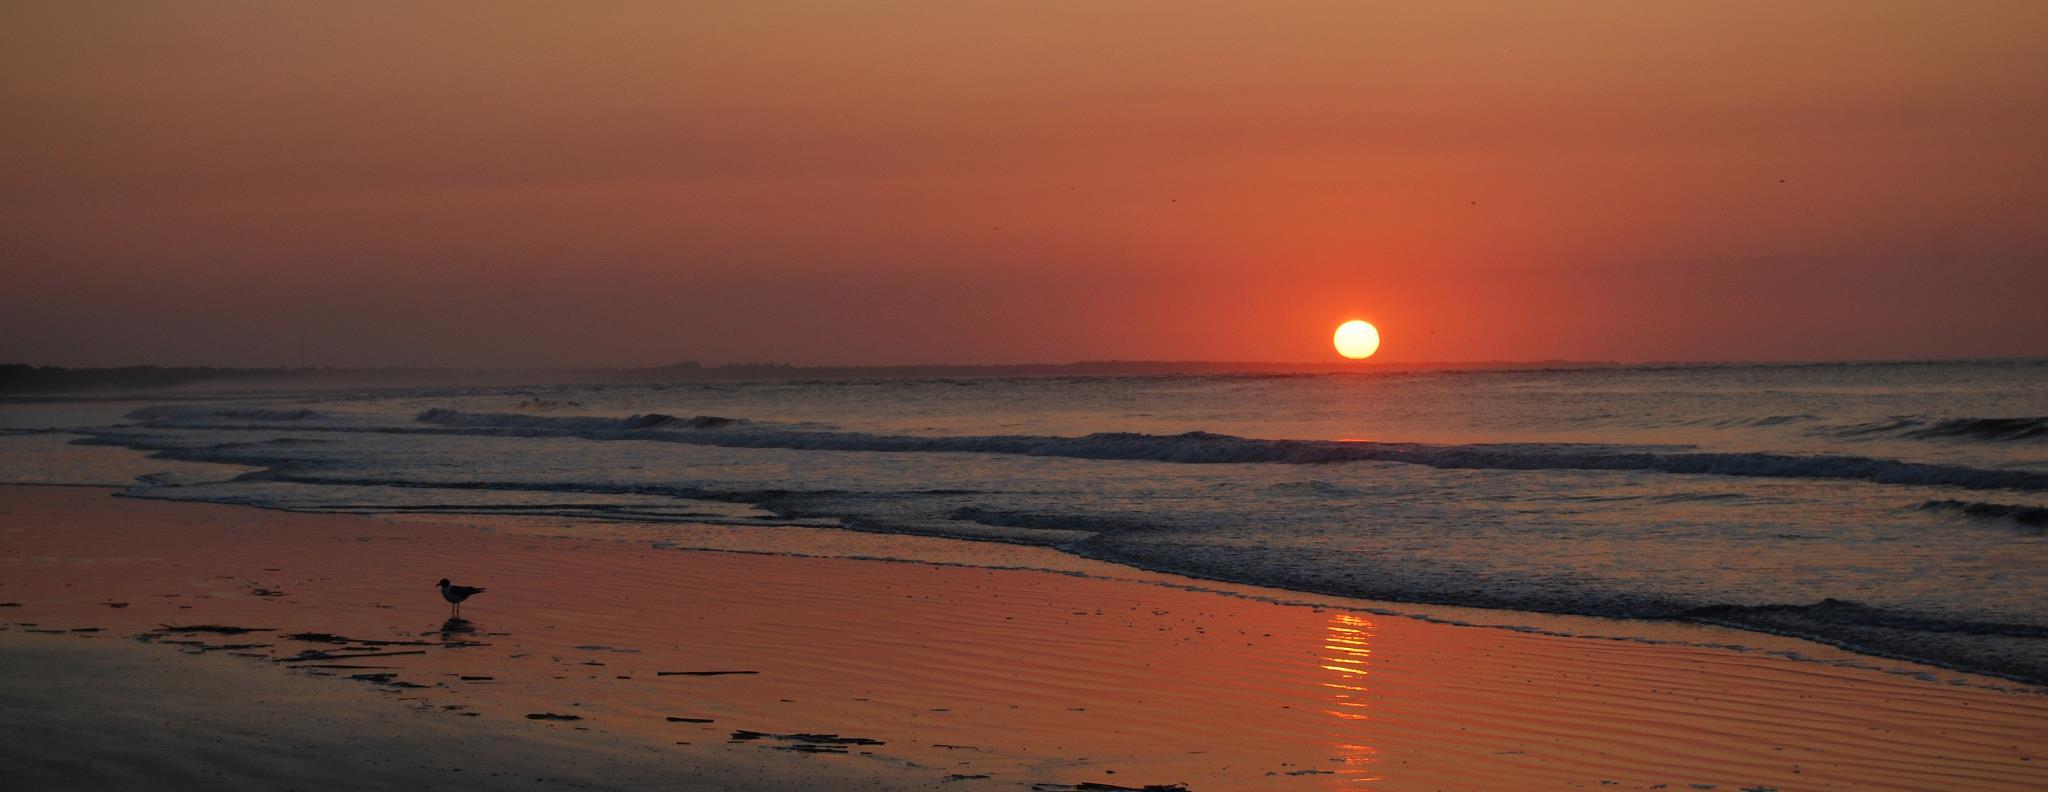 Coastal Getaways of SC Vacation Rental Management Company Charleston Area Seabrook Island